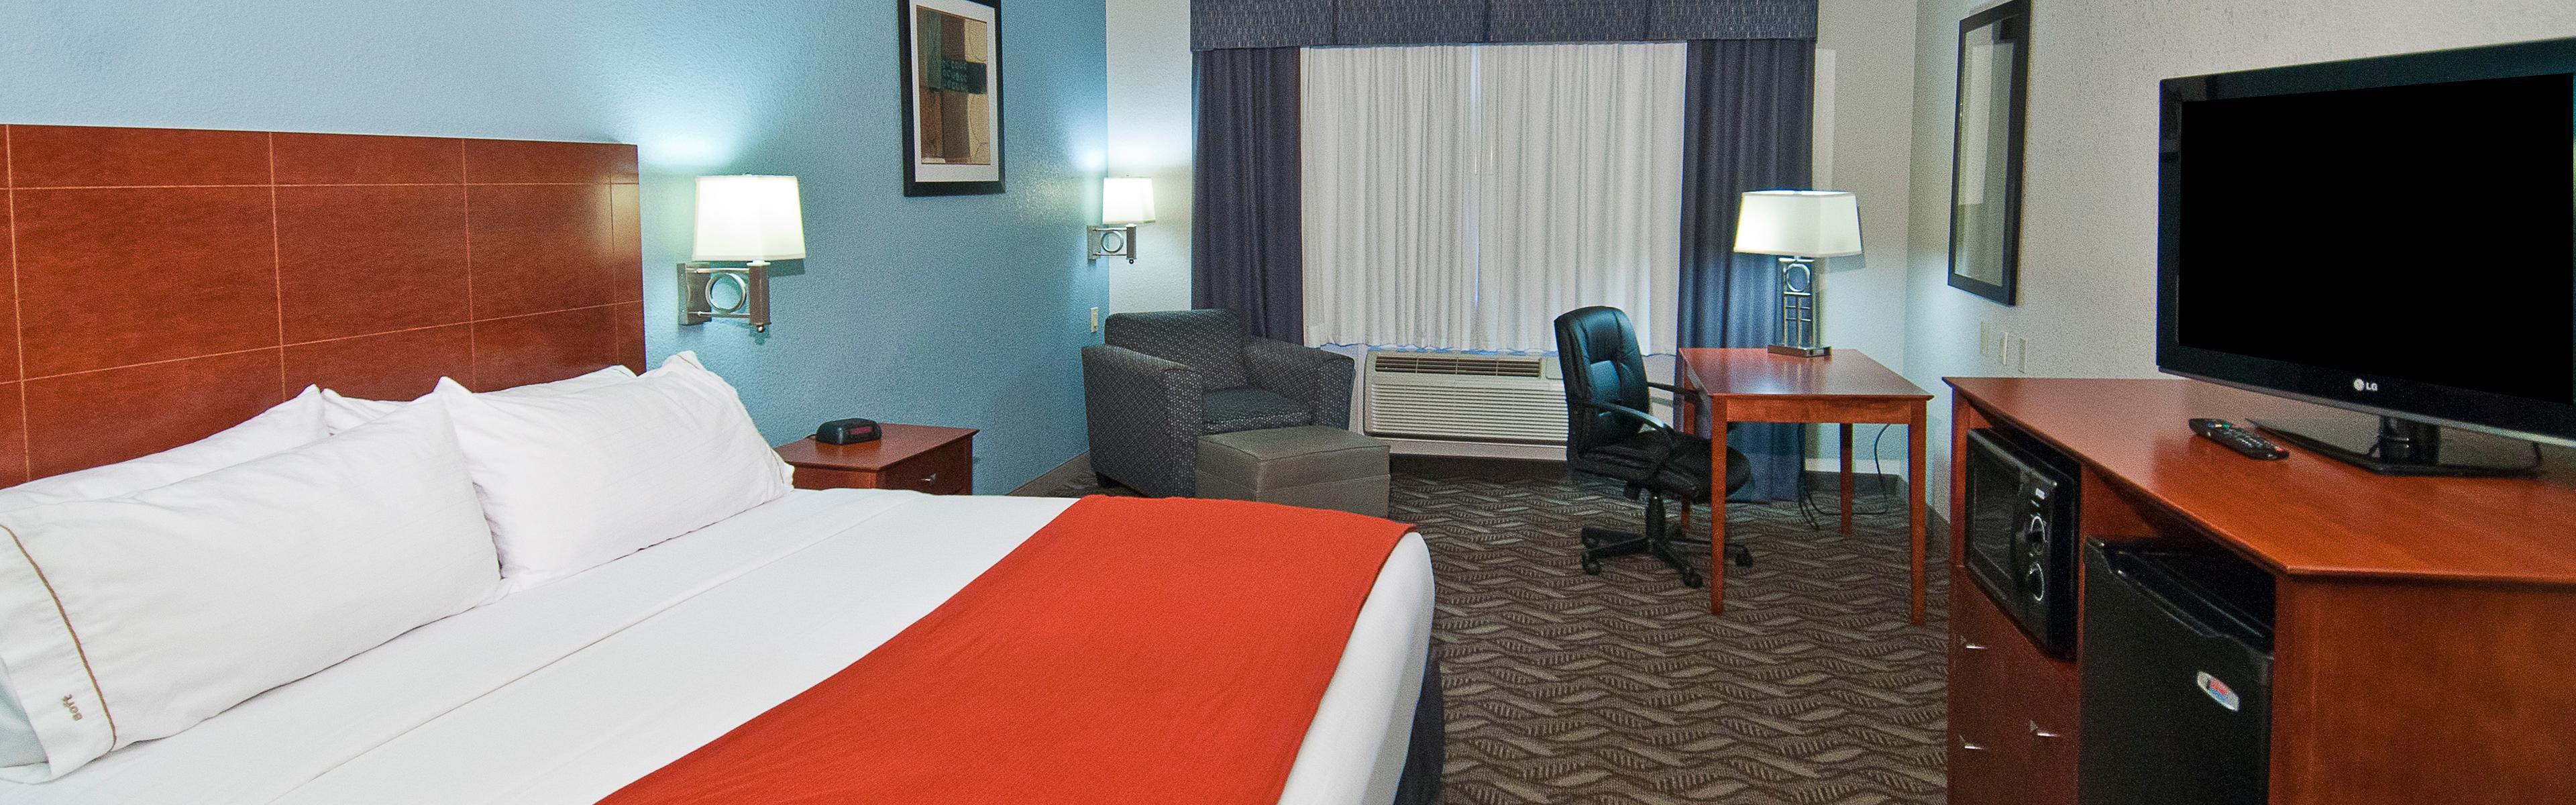 Holiday Inn Express & Suites Lake Charles image 1